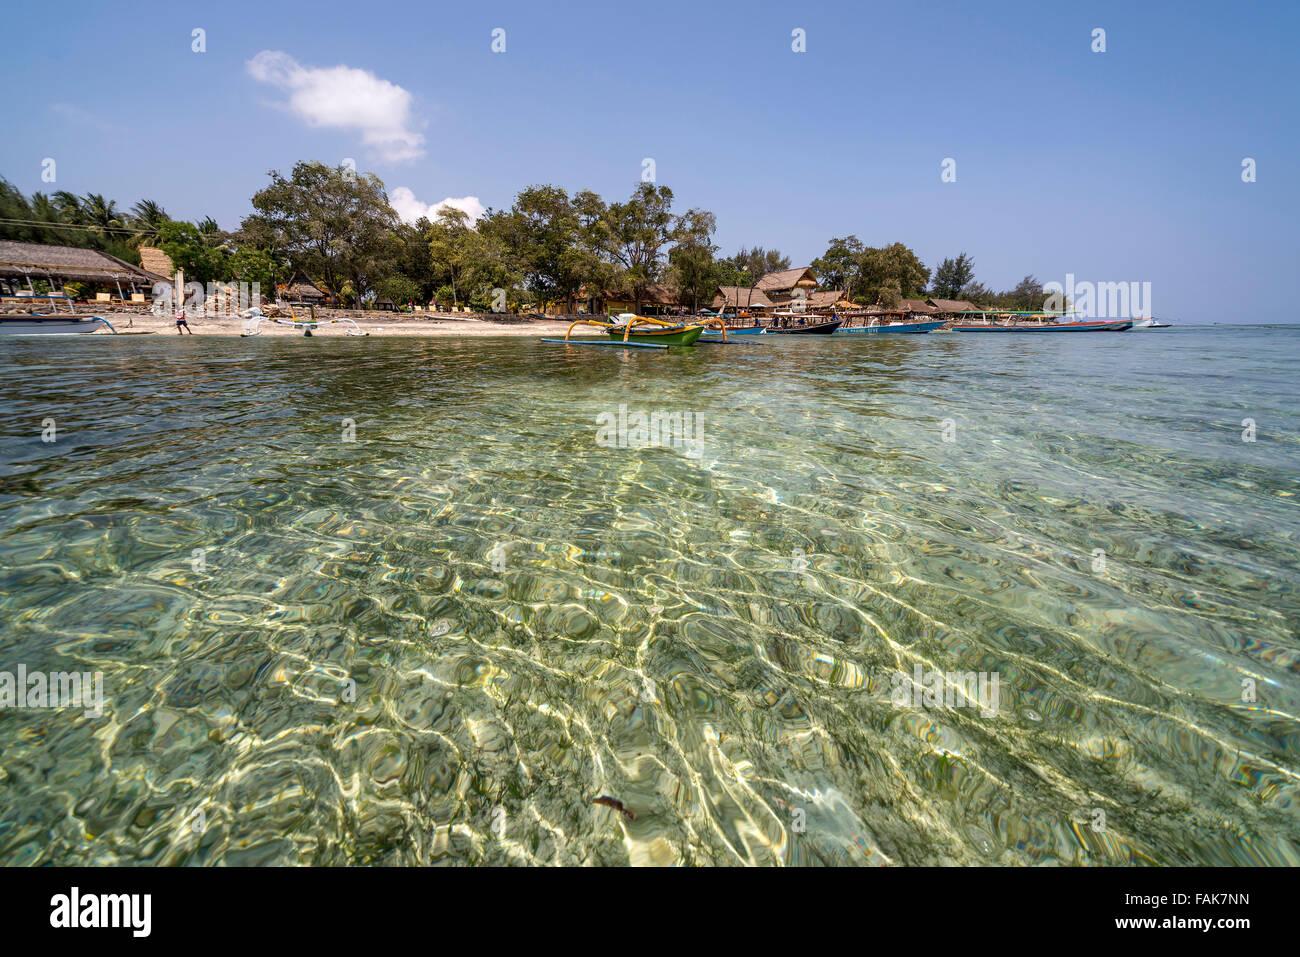 Playa de la pequeña isla de Gili Air, Lombok, Indonesia, Asia Imagen De Stock